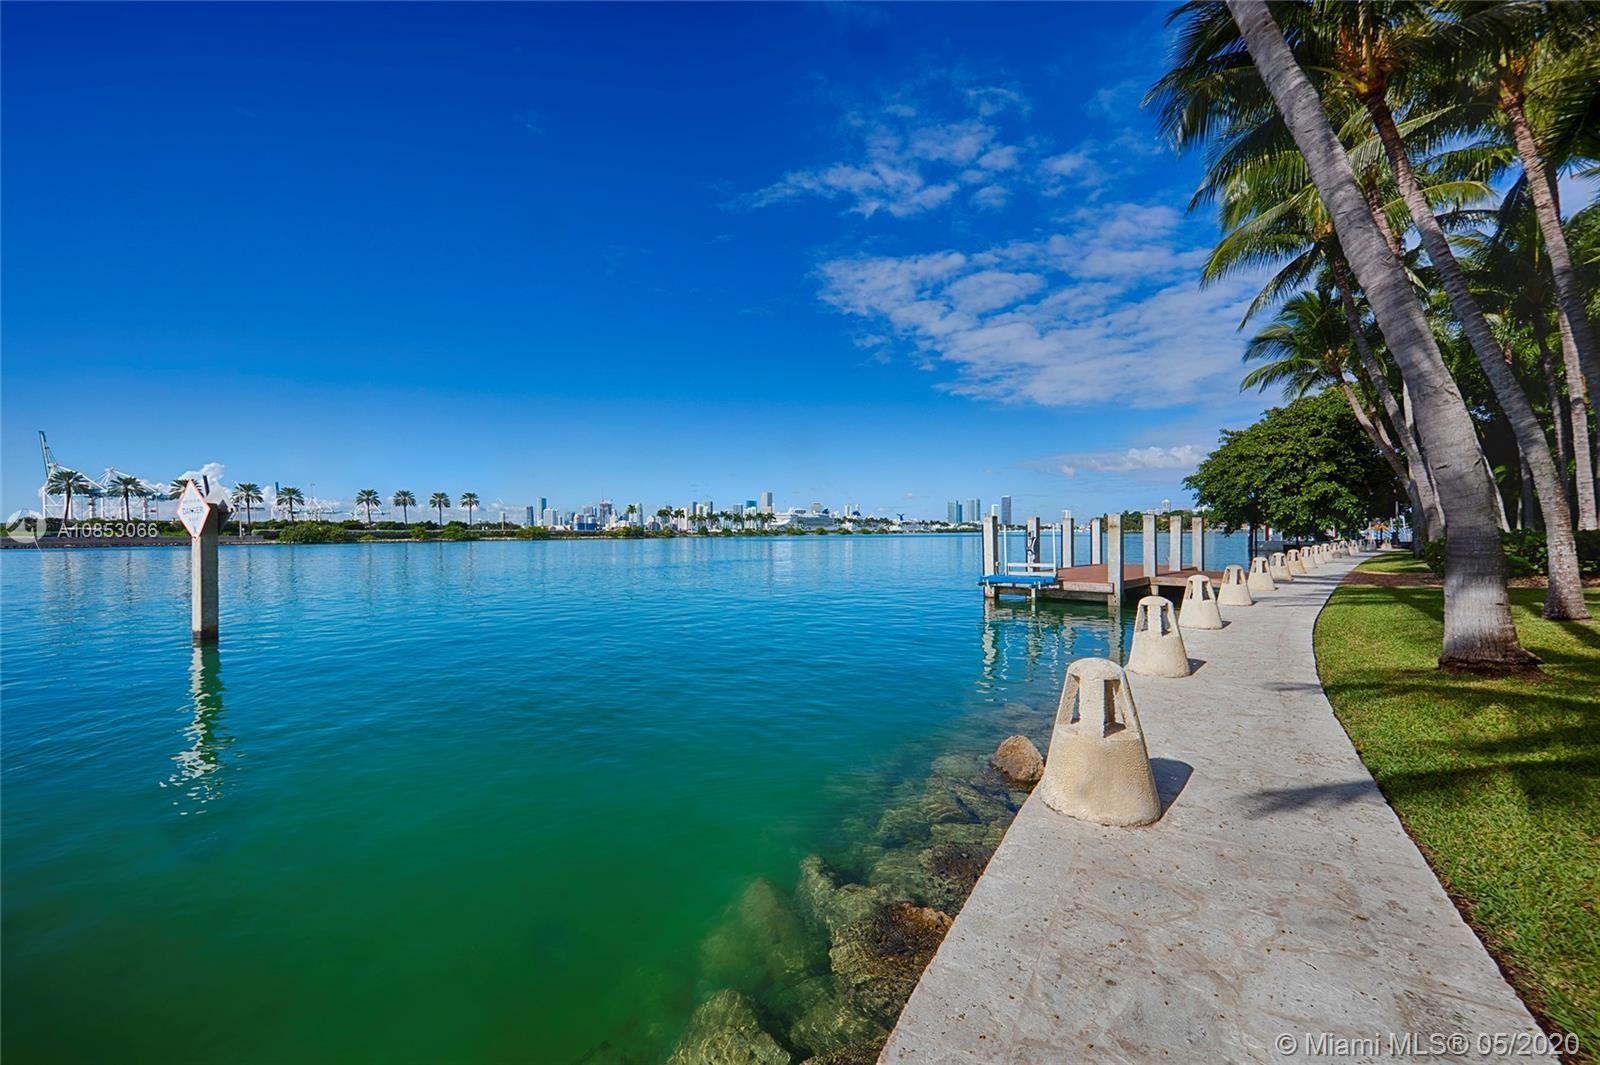 Photo 18 of Listing MLS a10853066 in 1 Star Island Dr Miami Beach FL 33139